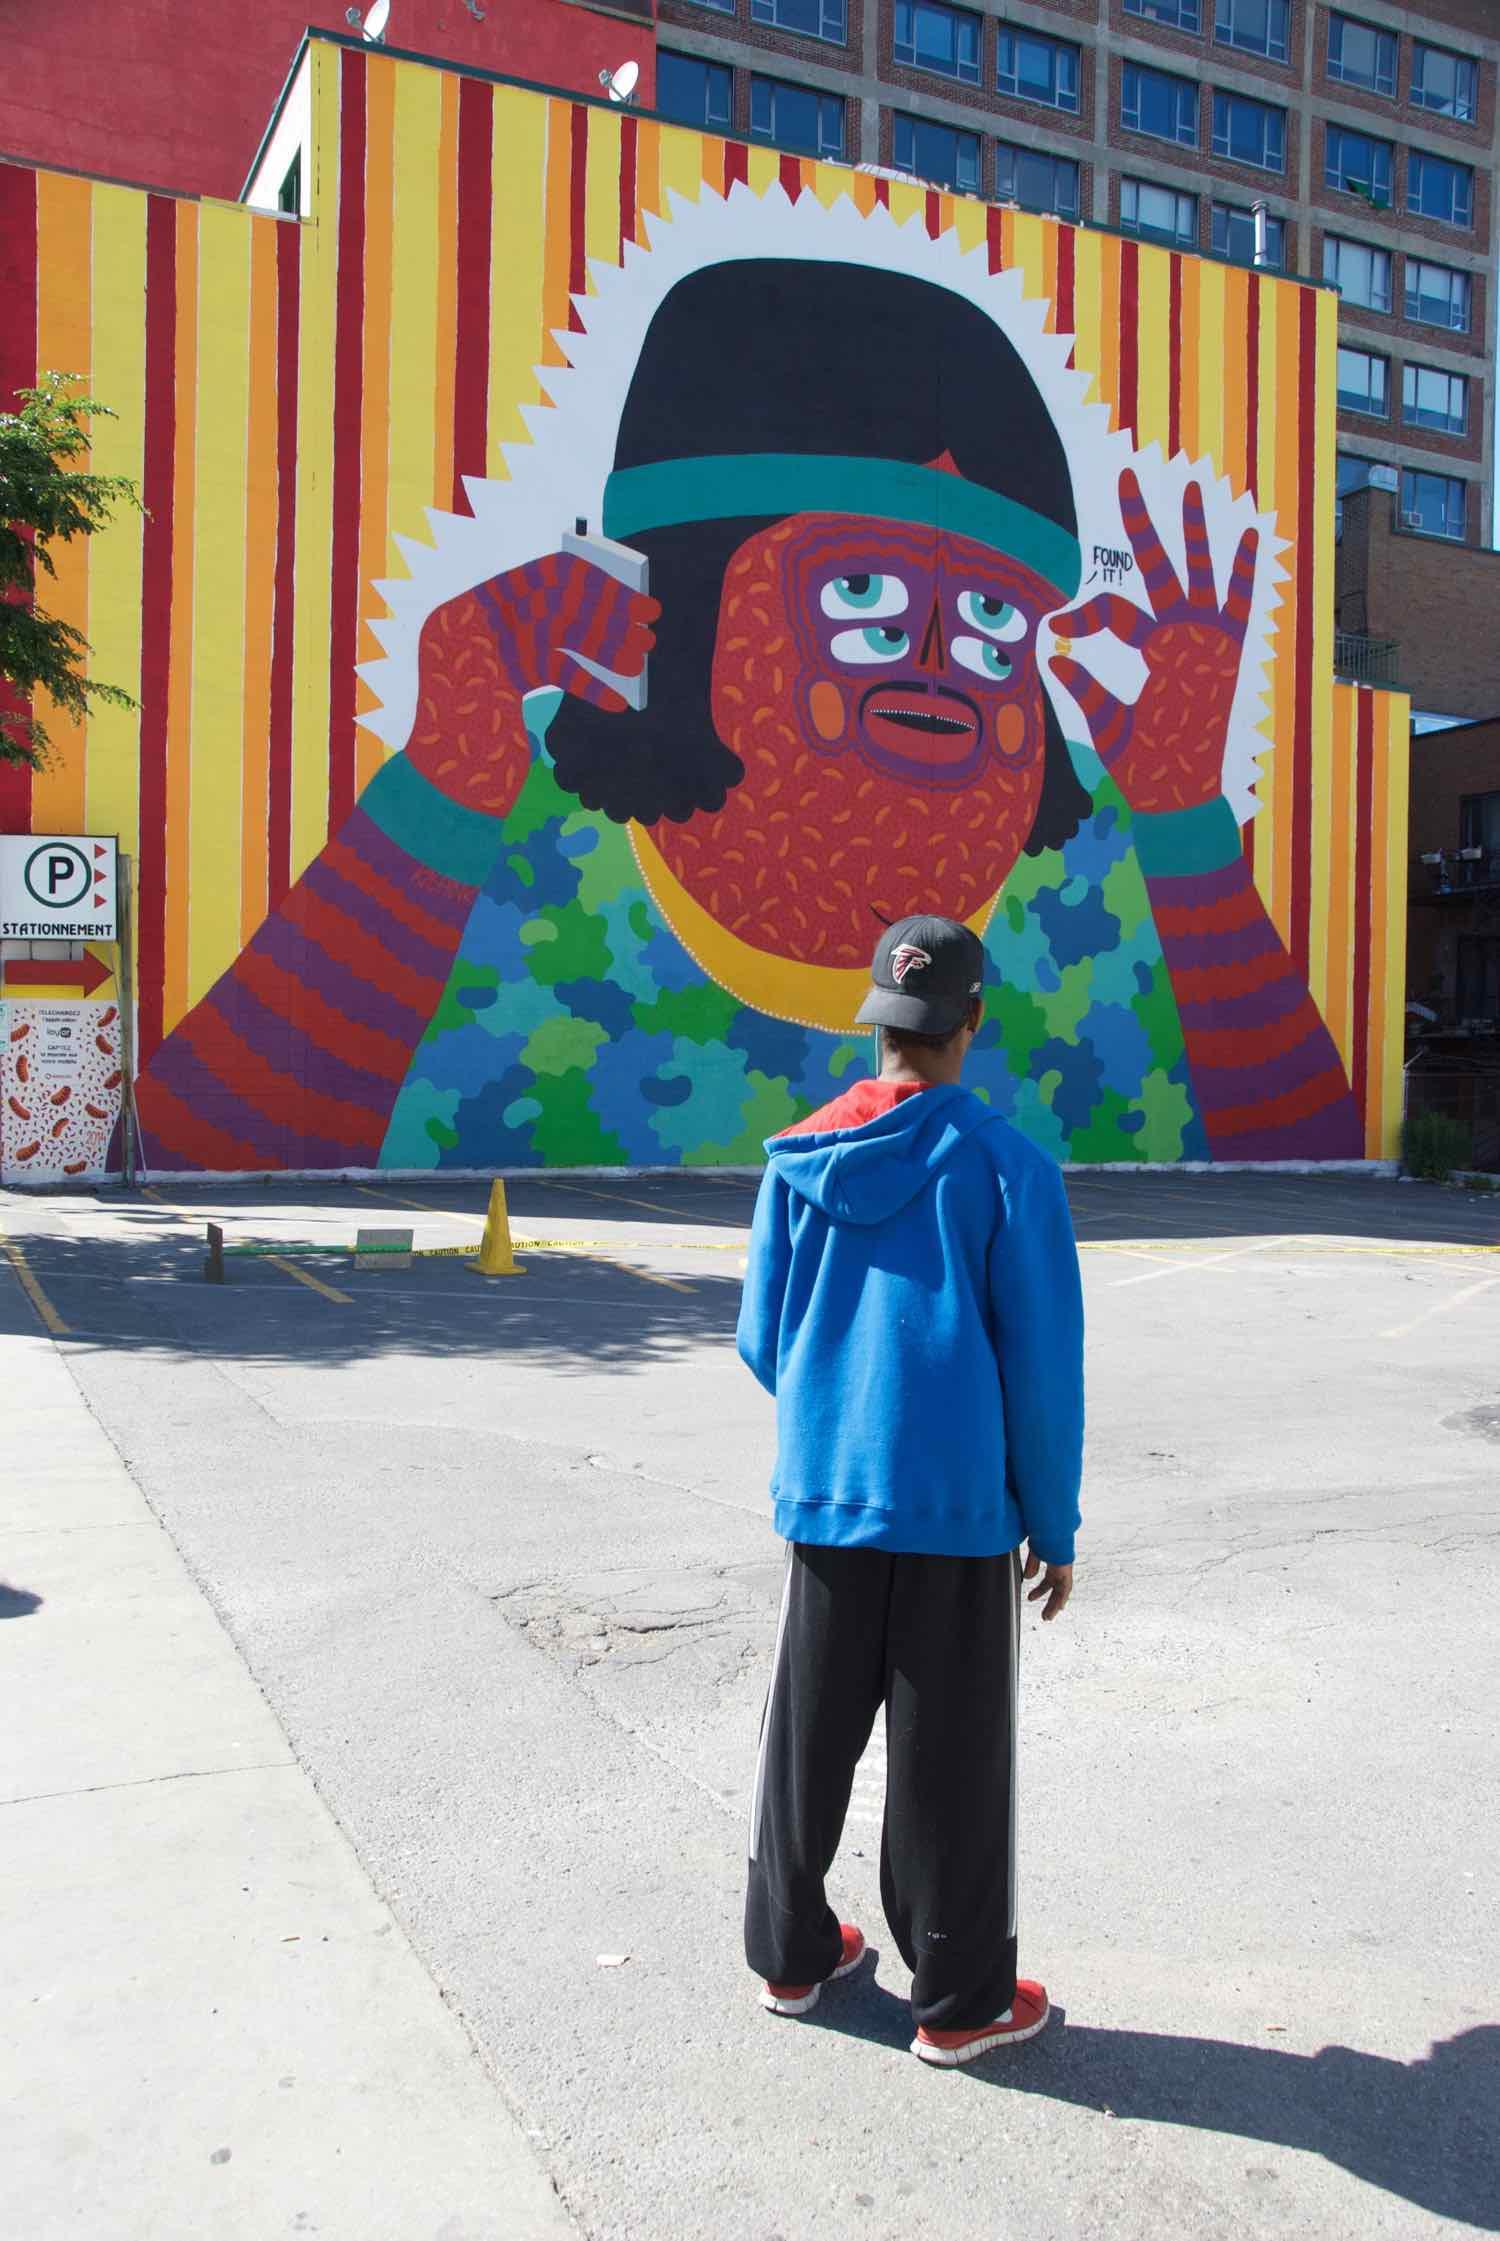 The_Walls_Of_Montreal-Ezra_Soiferman - 38.jpg